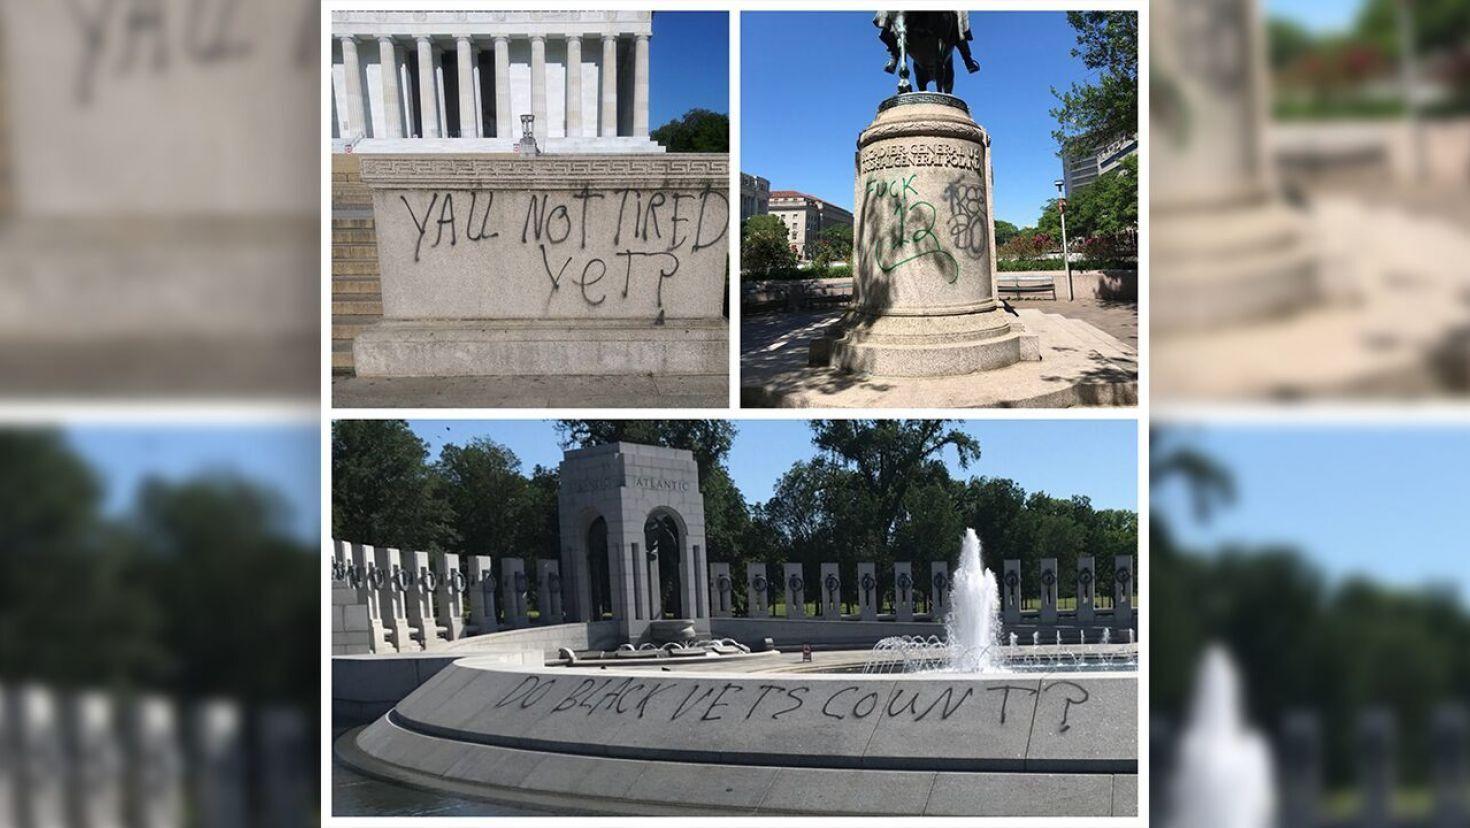 Vandals target historic monuments amid Floyd